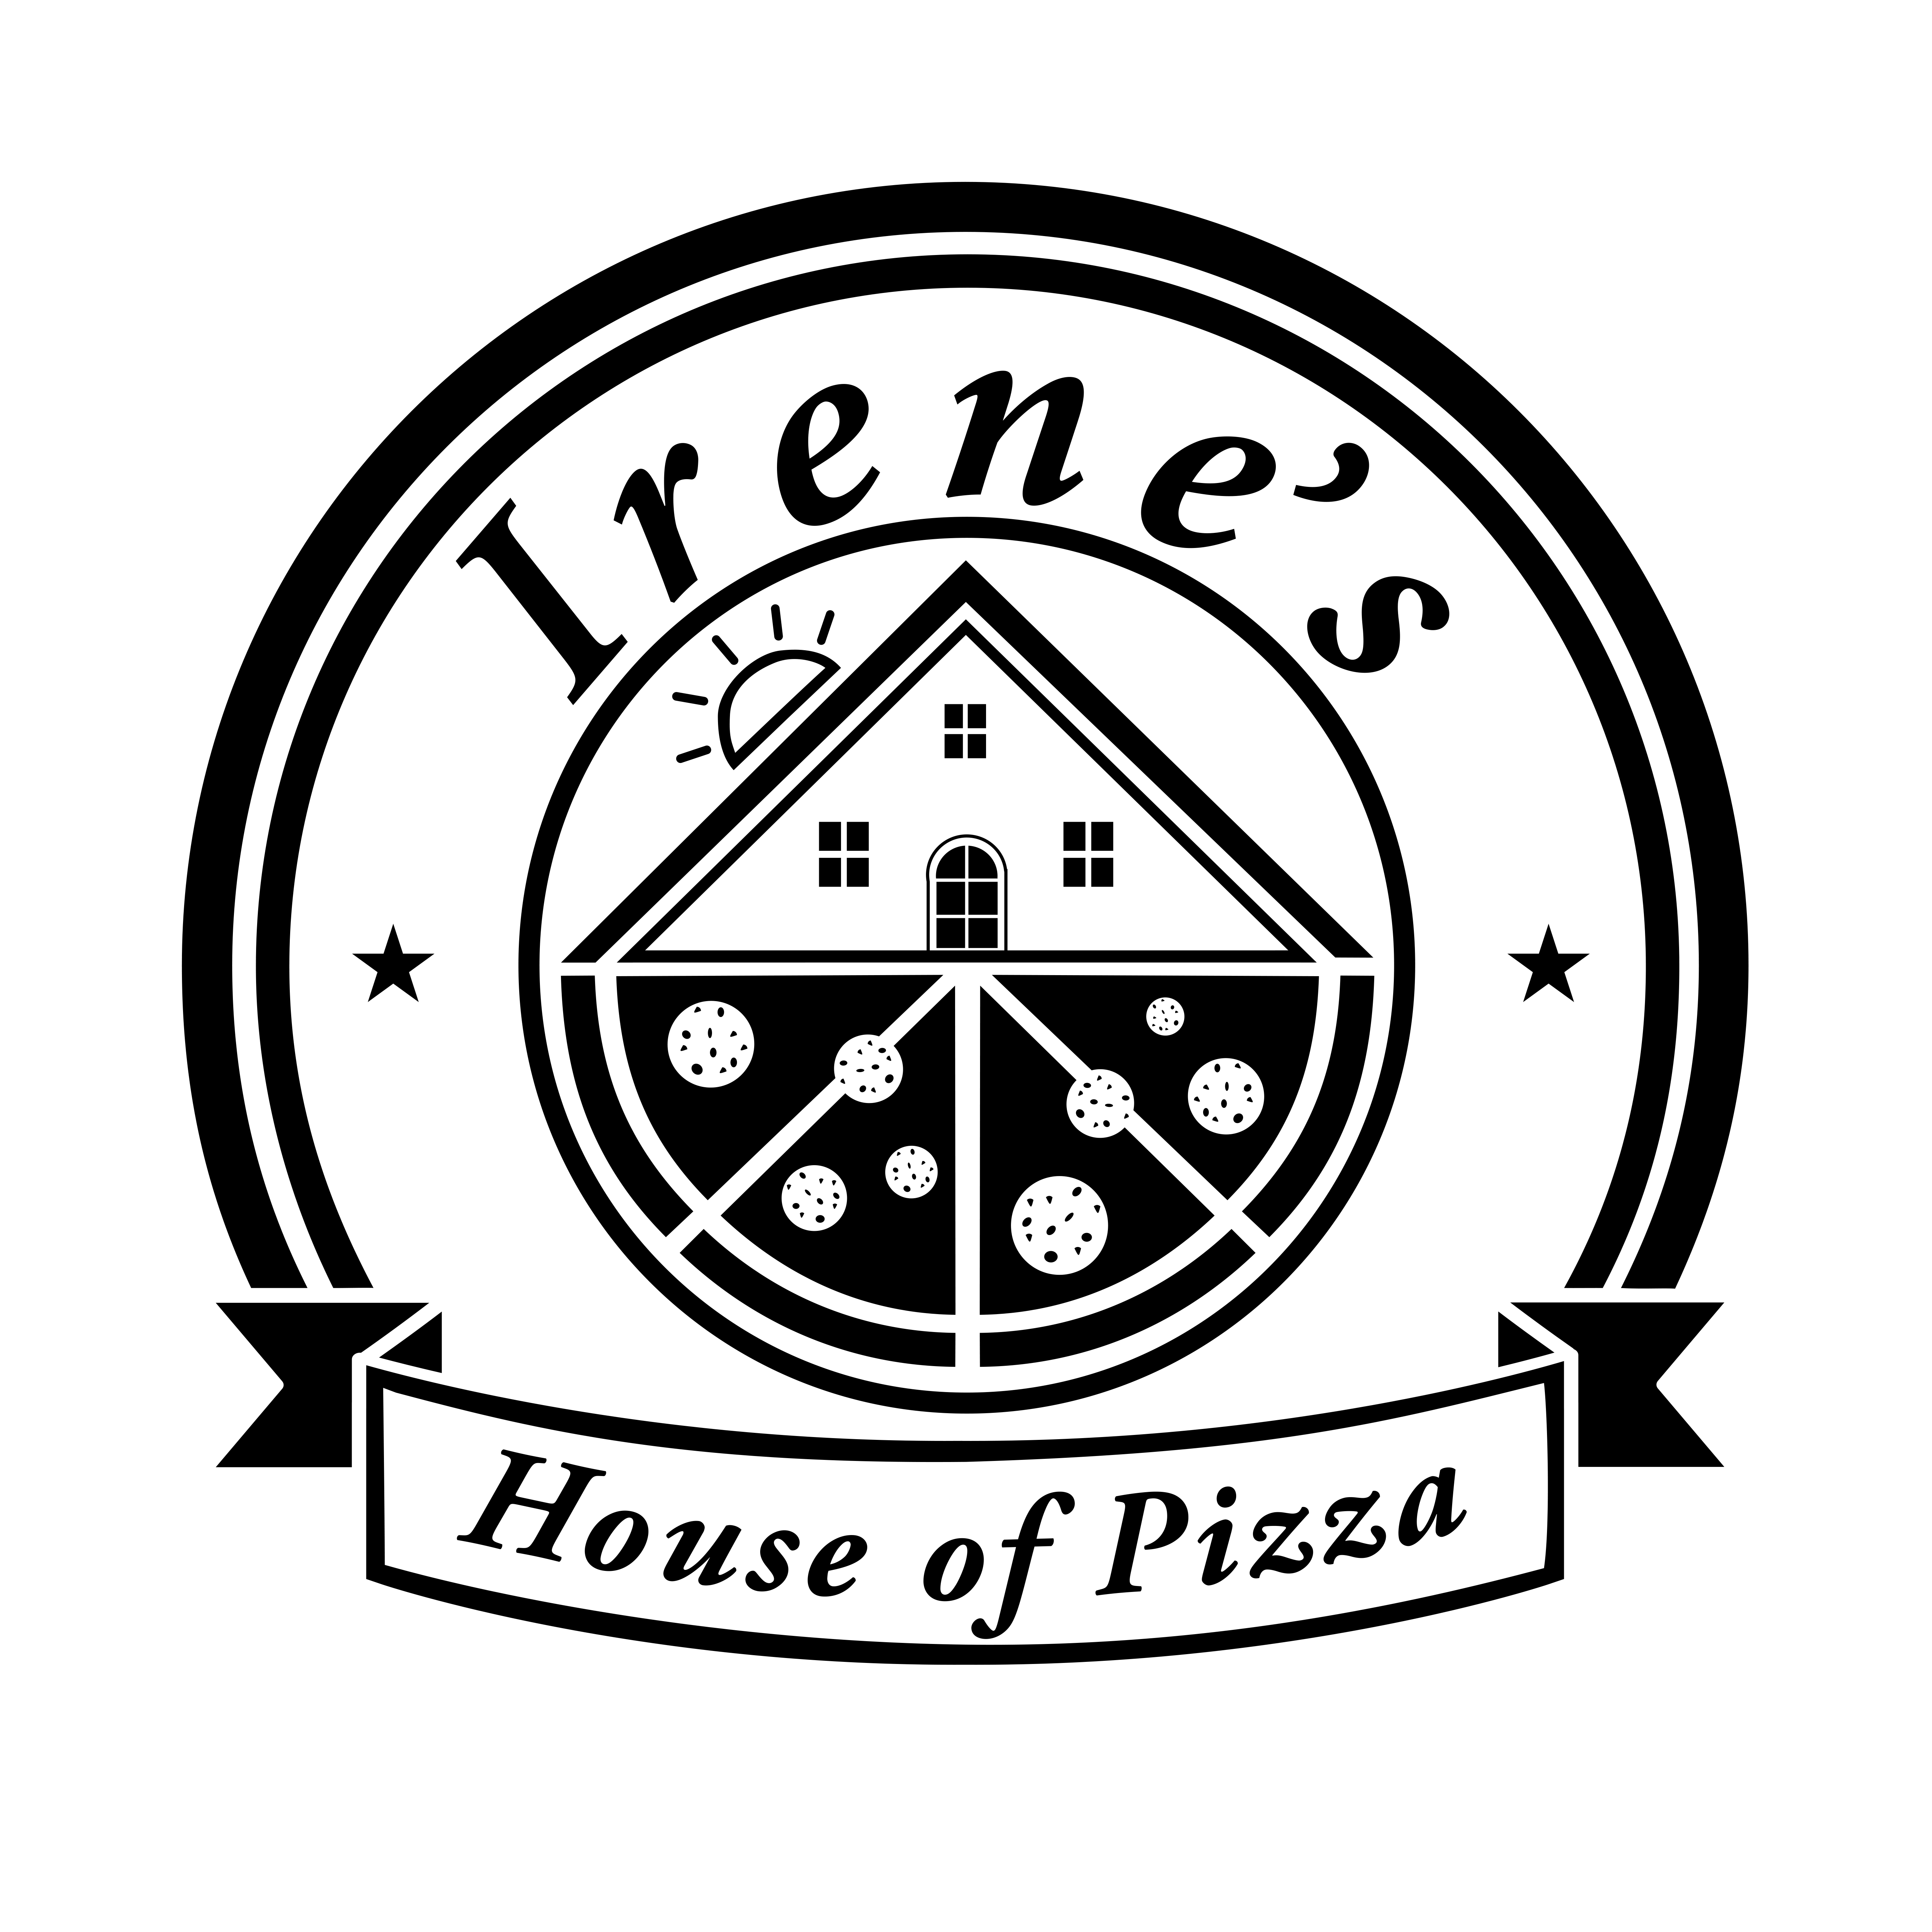 left-image